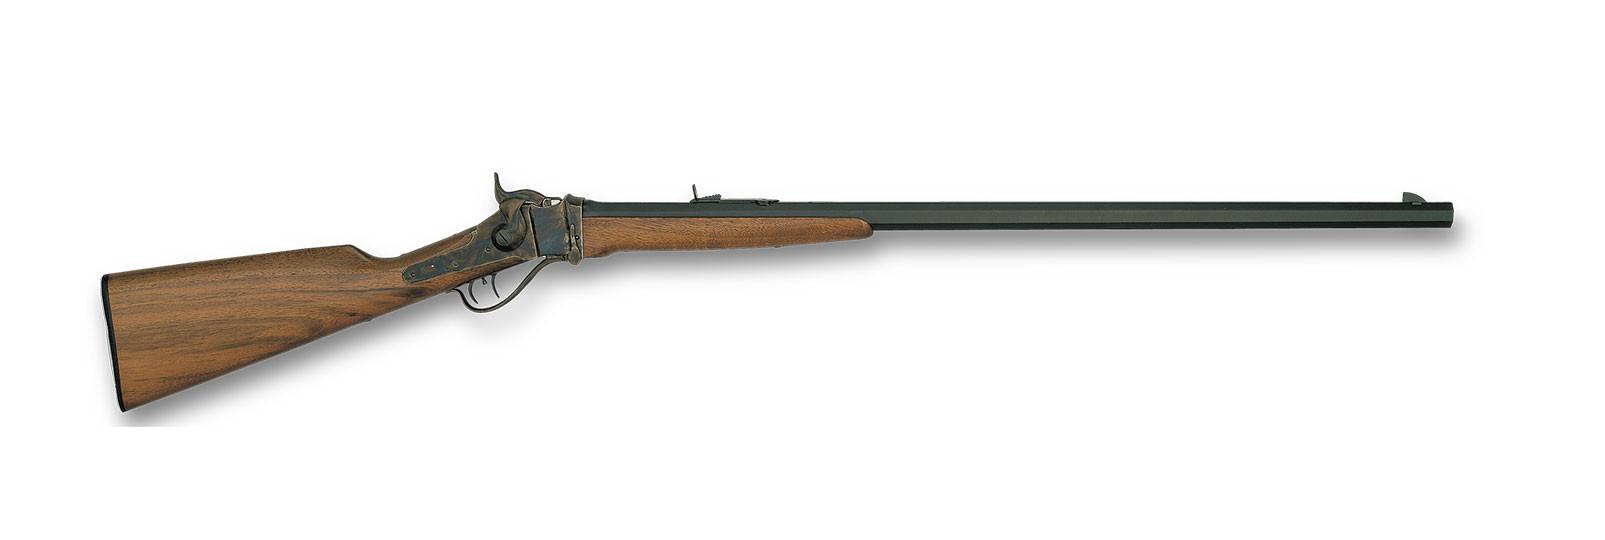 1874 sharps business .45-70